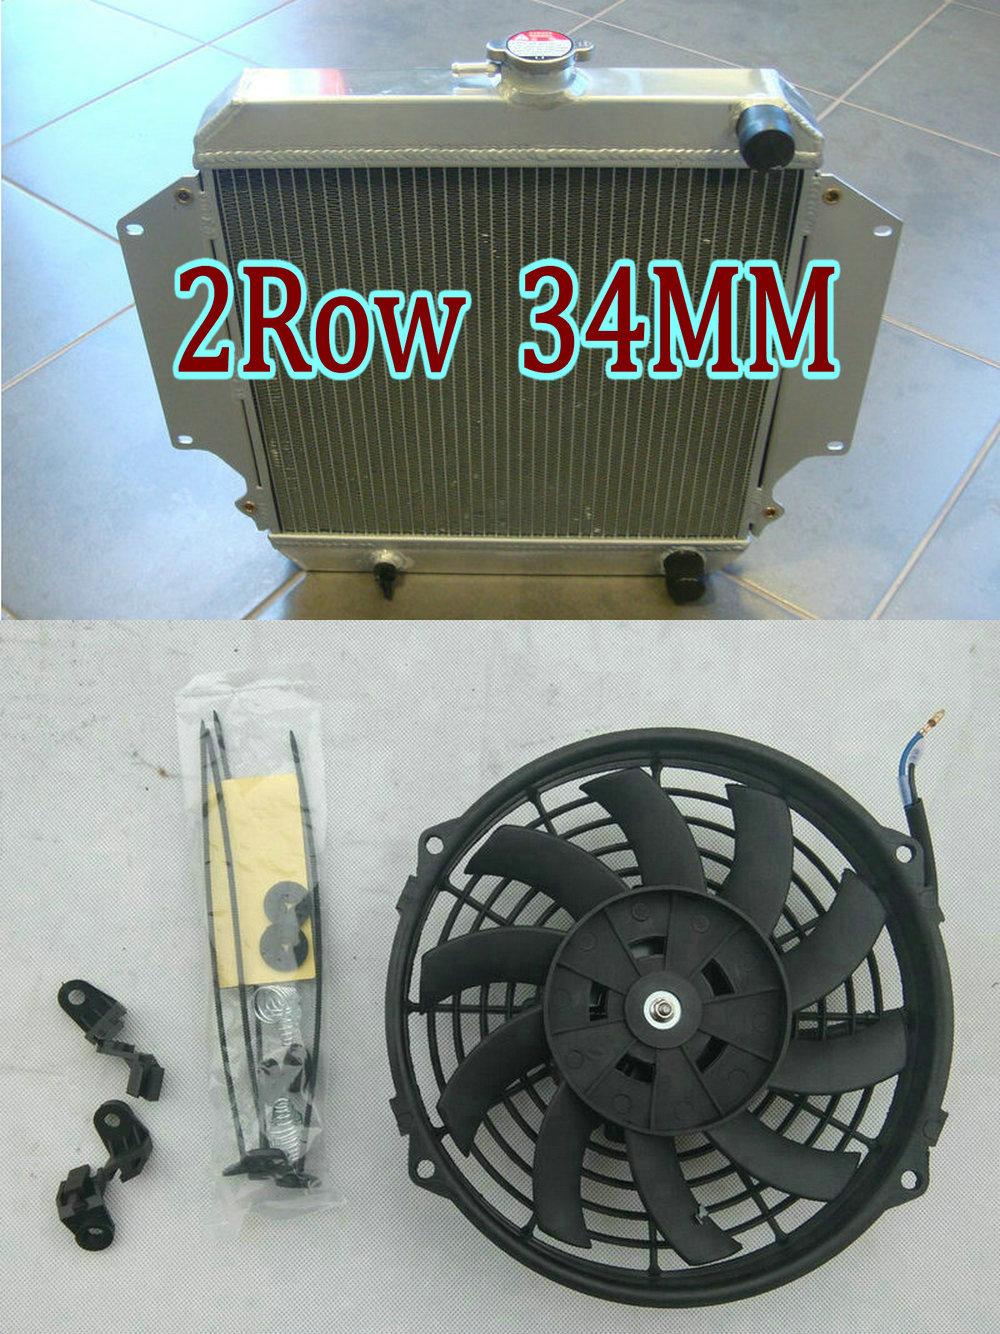 Radiador y ventilador de aluminio para Suzuki Sierra 2Dr Spftop Hardtop 1.3L SJ410 SJ413 OS 1,3 1981-1996 MT Jimny MK2 Potohar Santana SJ